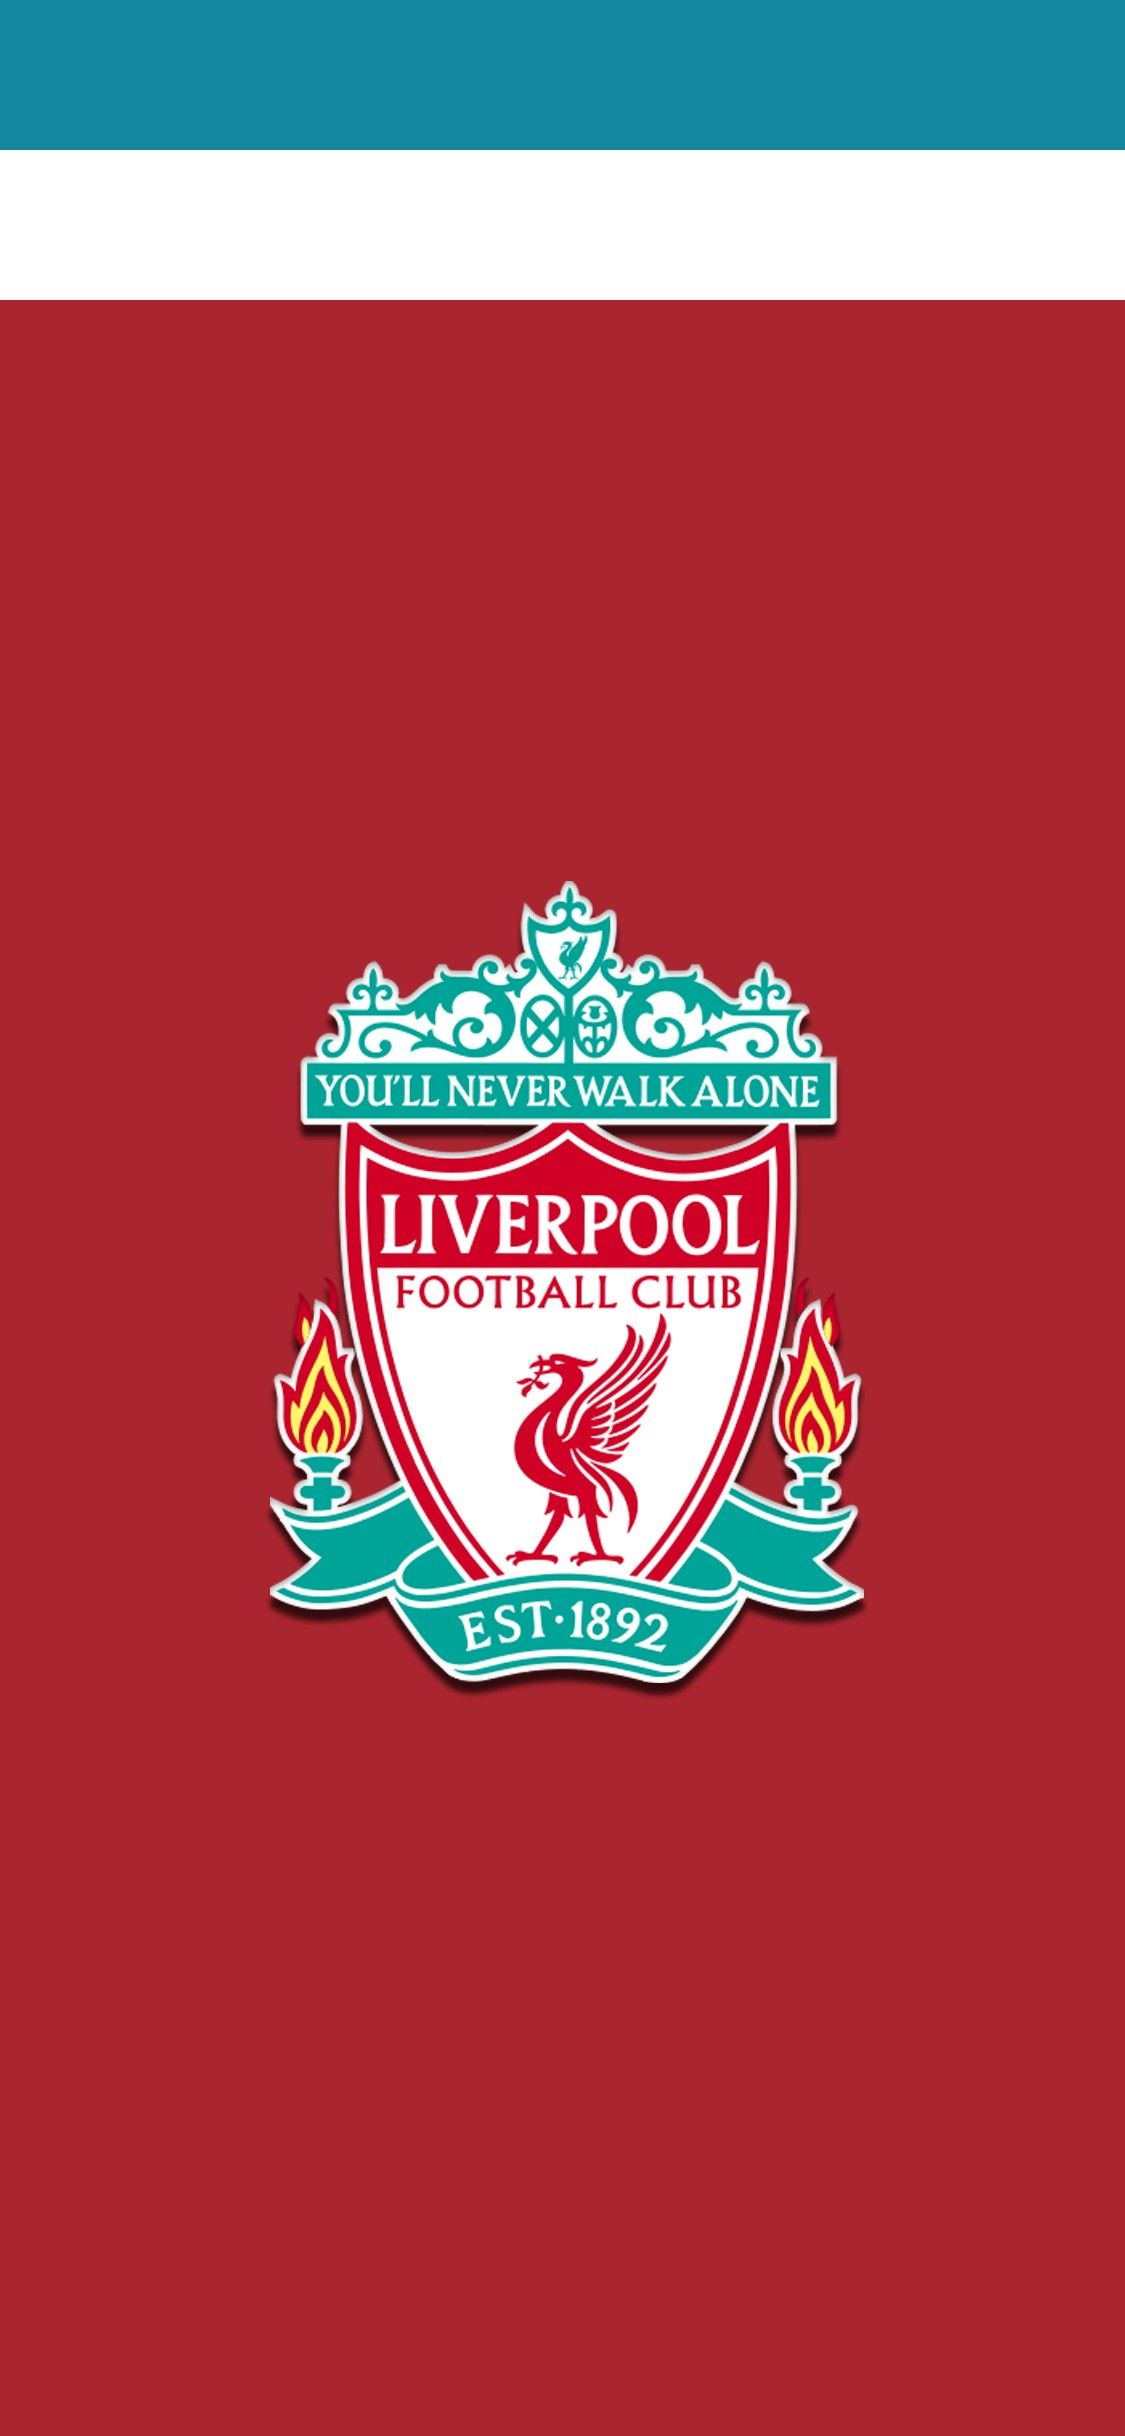 Liverpool Away Kit 20/21 Wallpaper - Liverpool Football Club 2020 21 Away Kit Nike News ...